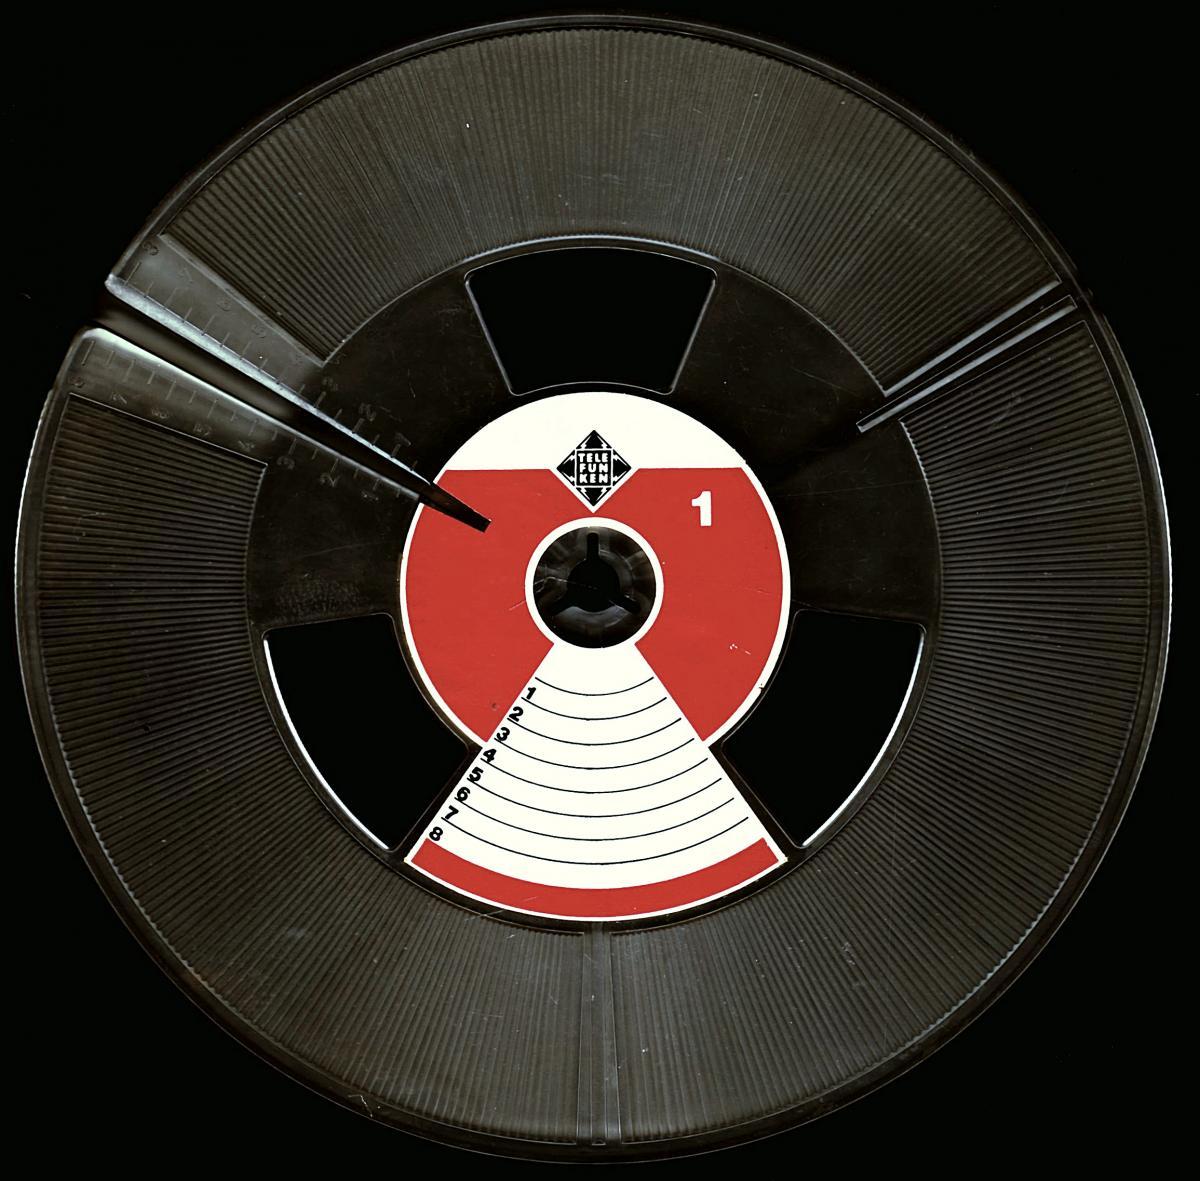 2 x Telefunken Tonband-Leerspule - ca. 18 cm Durchmesser  1